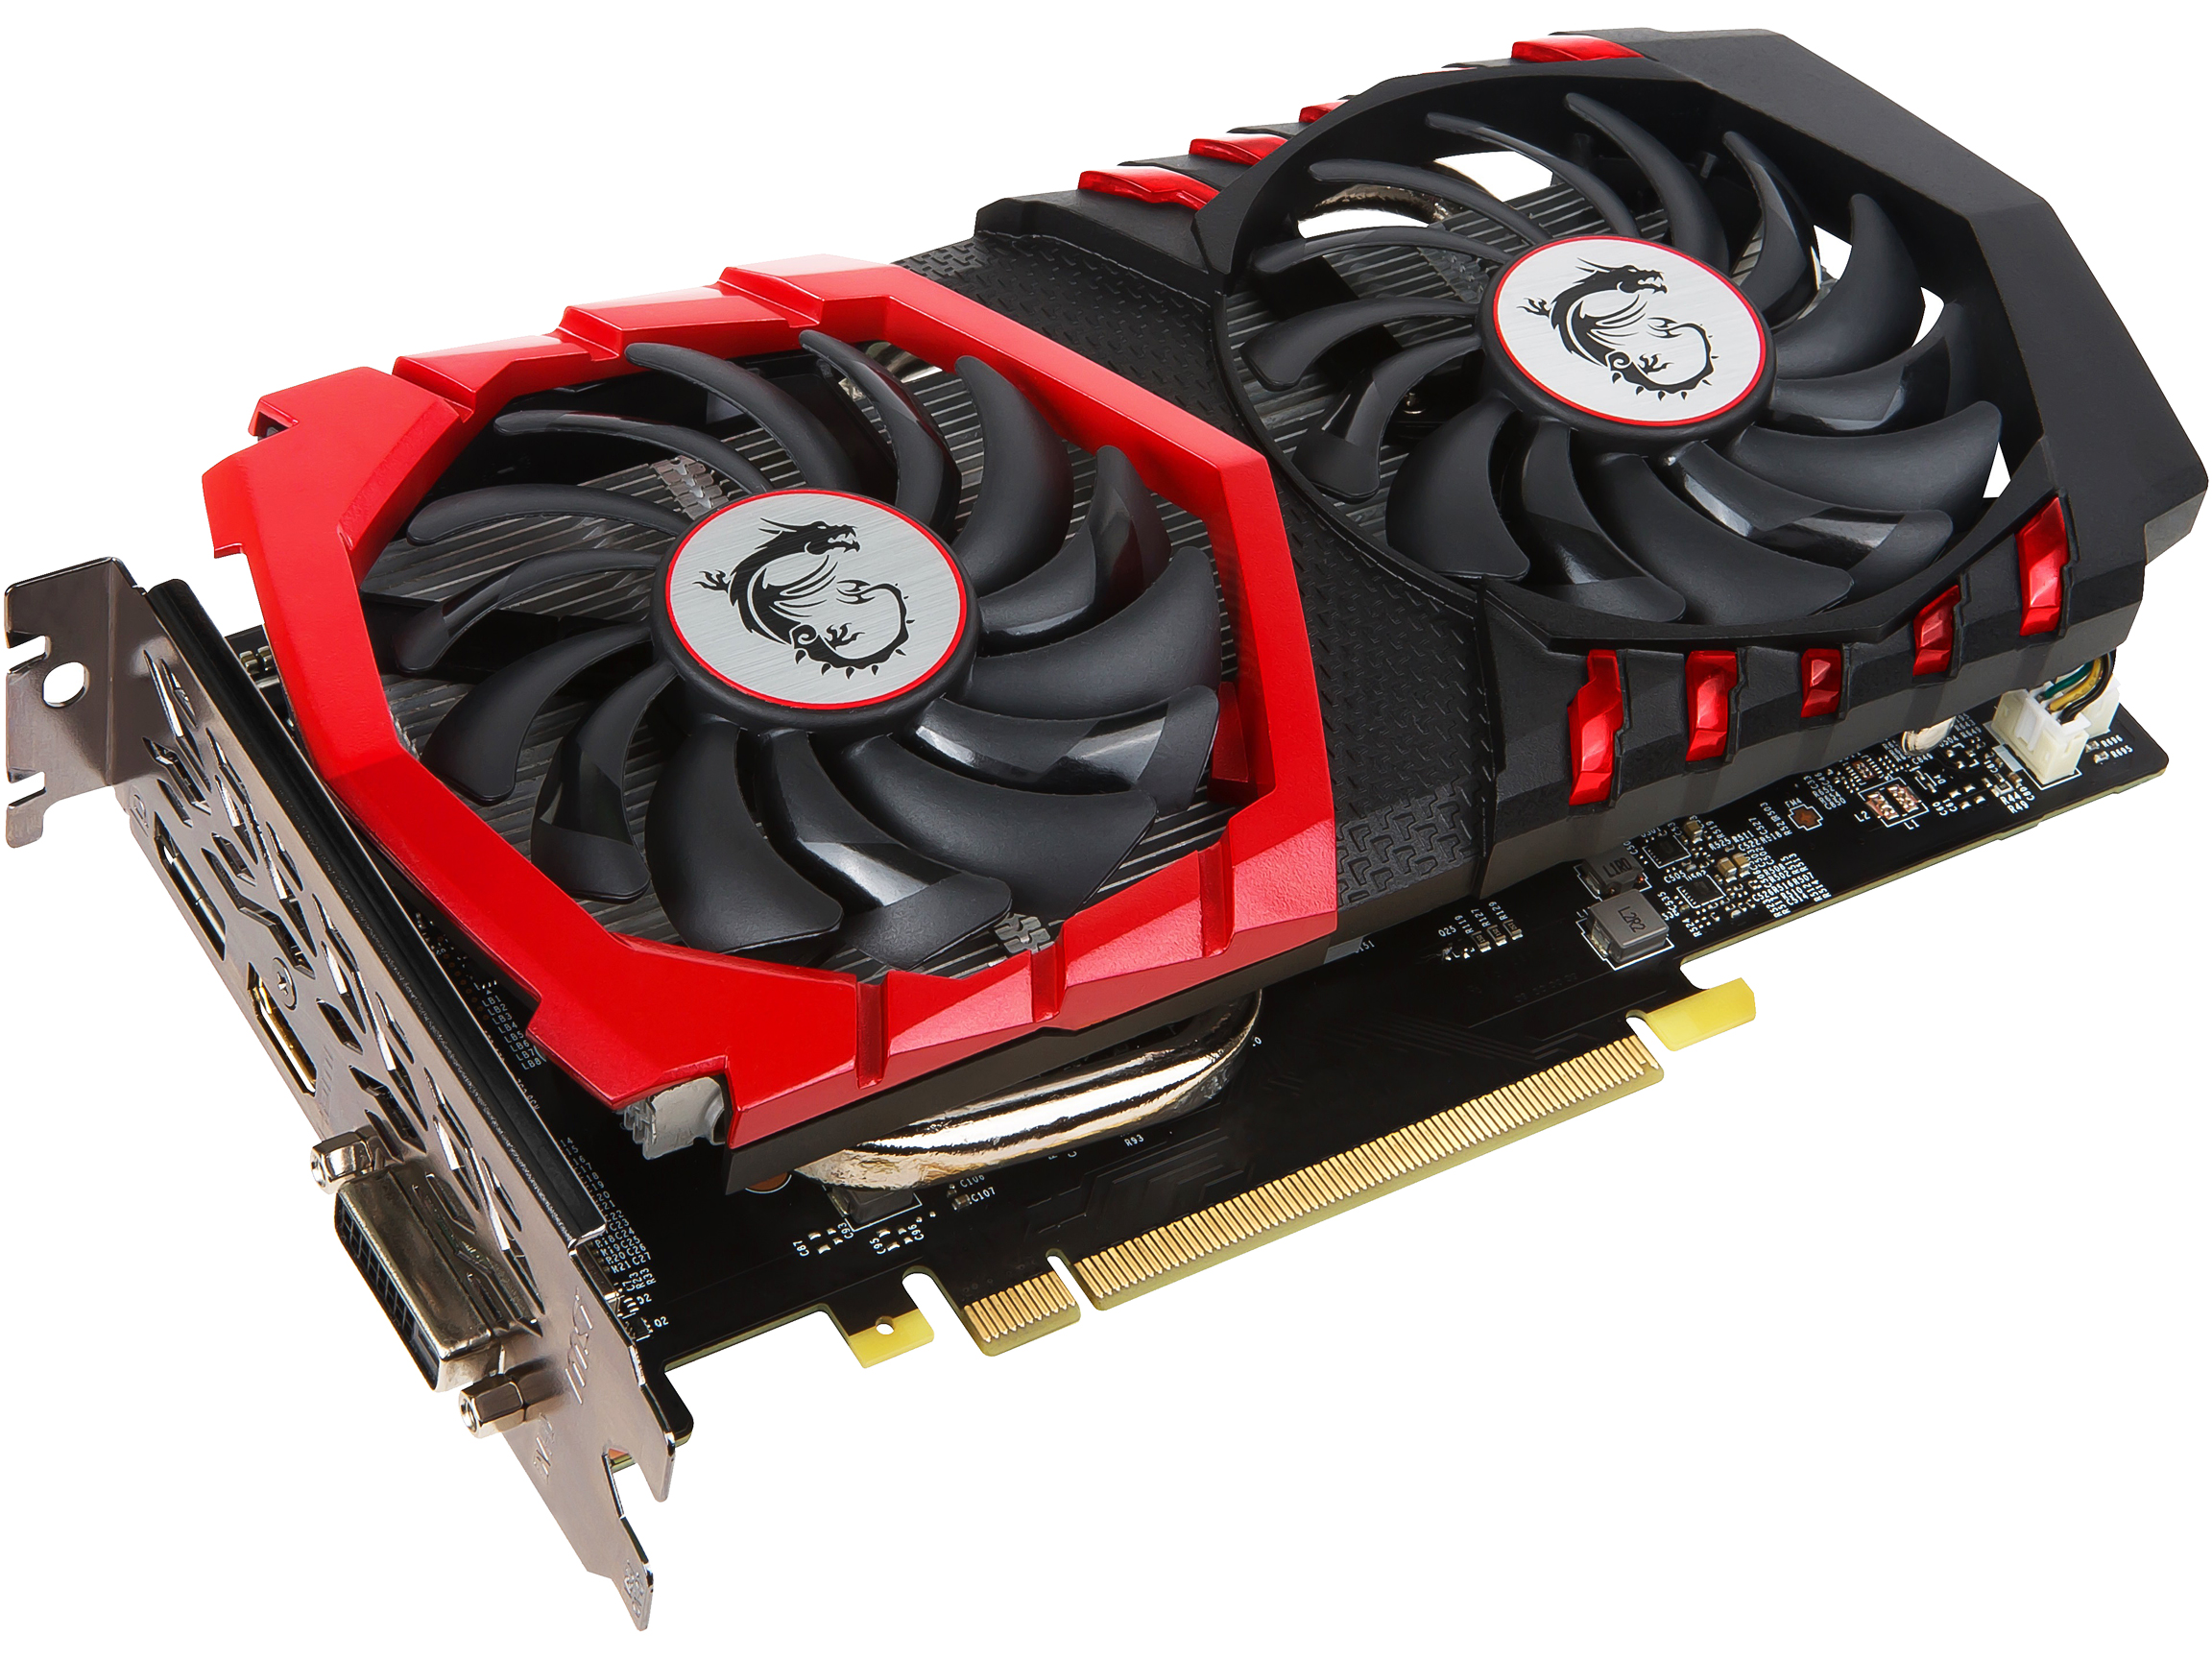 MSI GeForce GTX 1050 Ti GAMING X Graphics Card